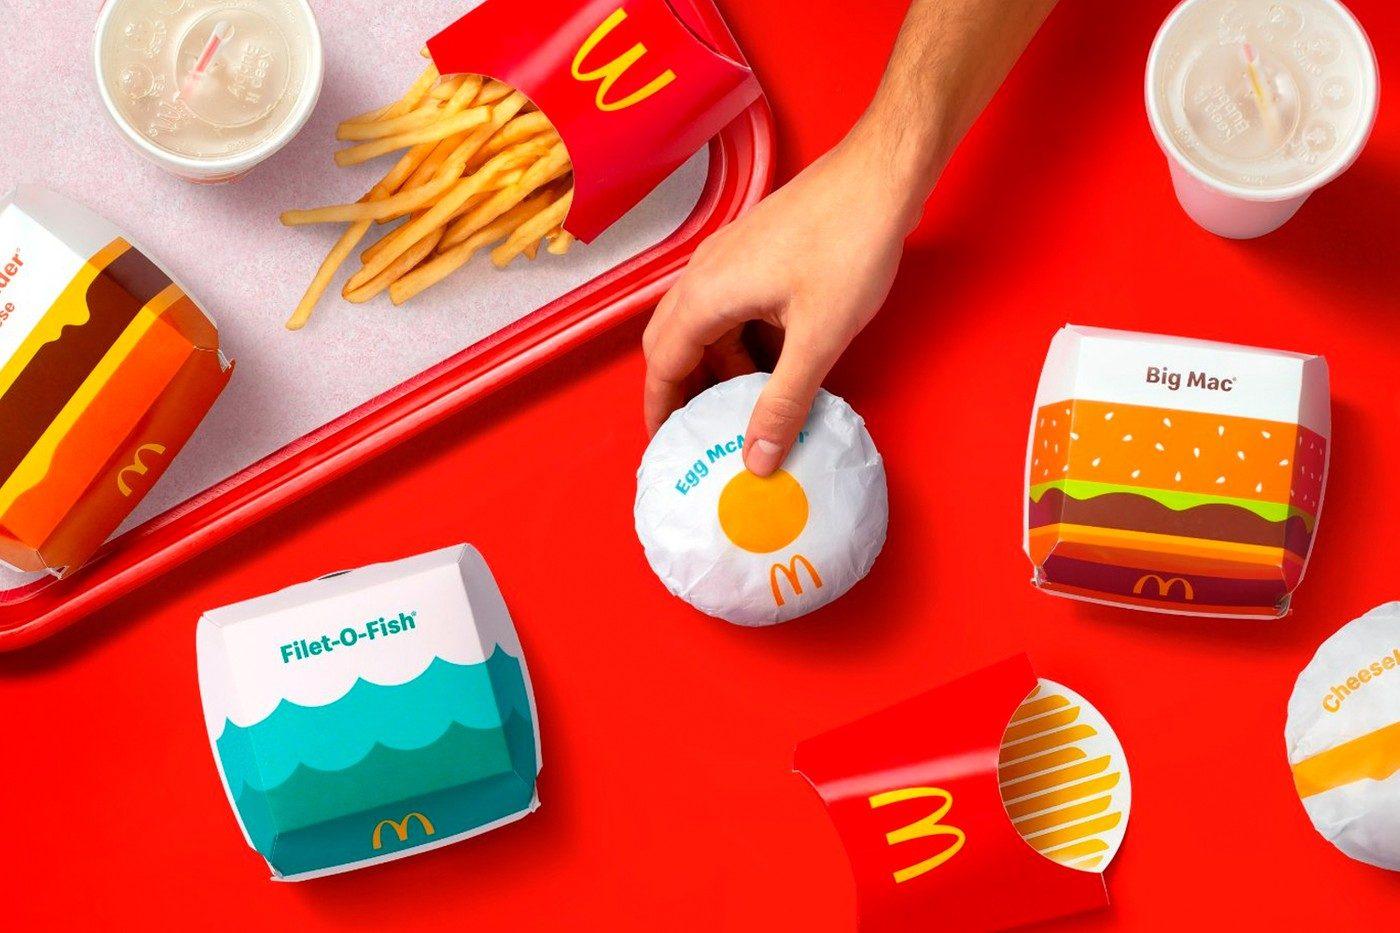 https___hypebeast.com_image_2021_02_mcdonalds-global-packaging-redesign-pearlfisher-info-1